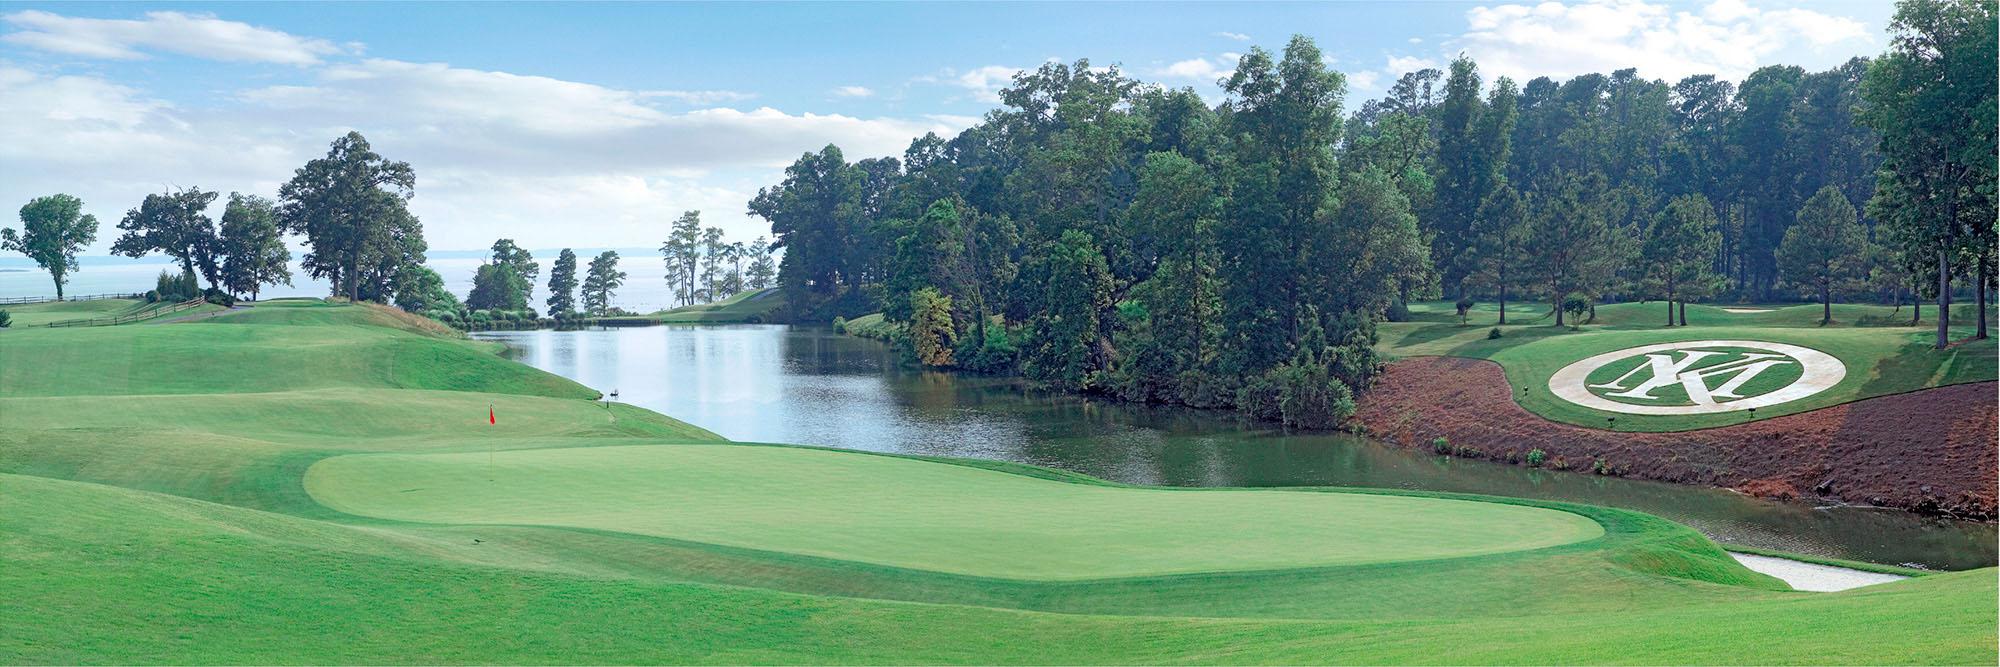 Golf Course Image - Kingsmill Resort & Spa No. 18